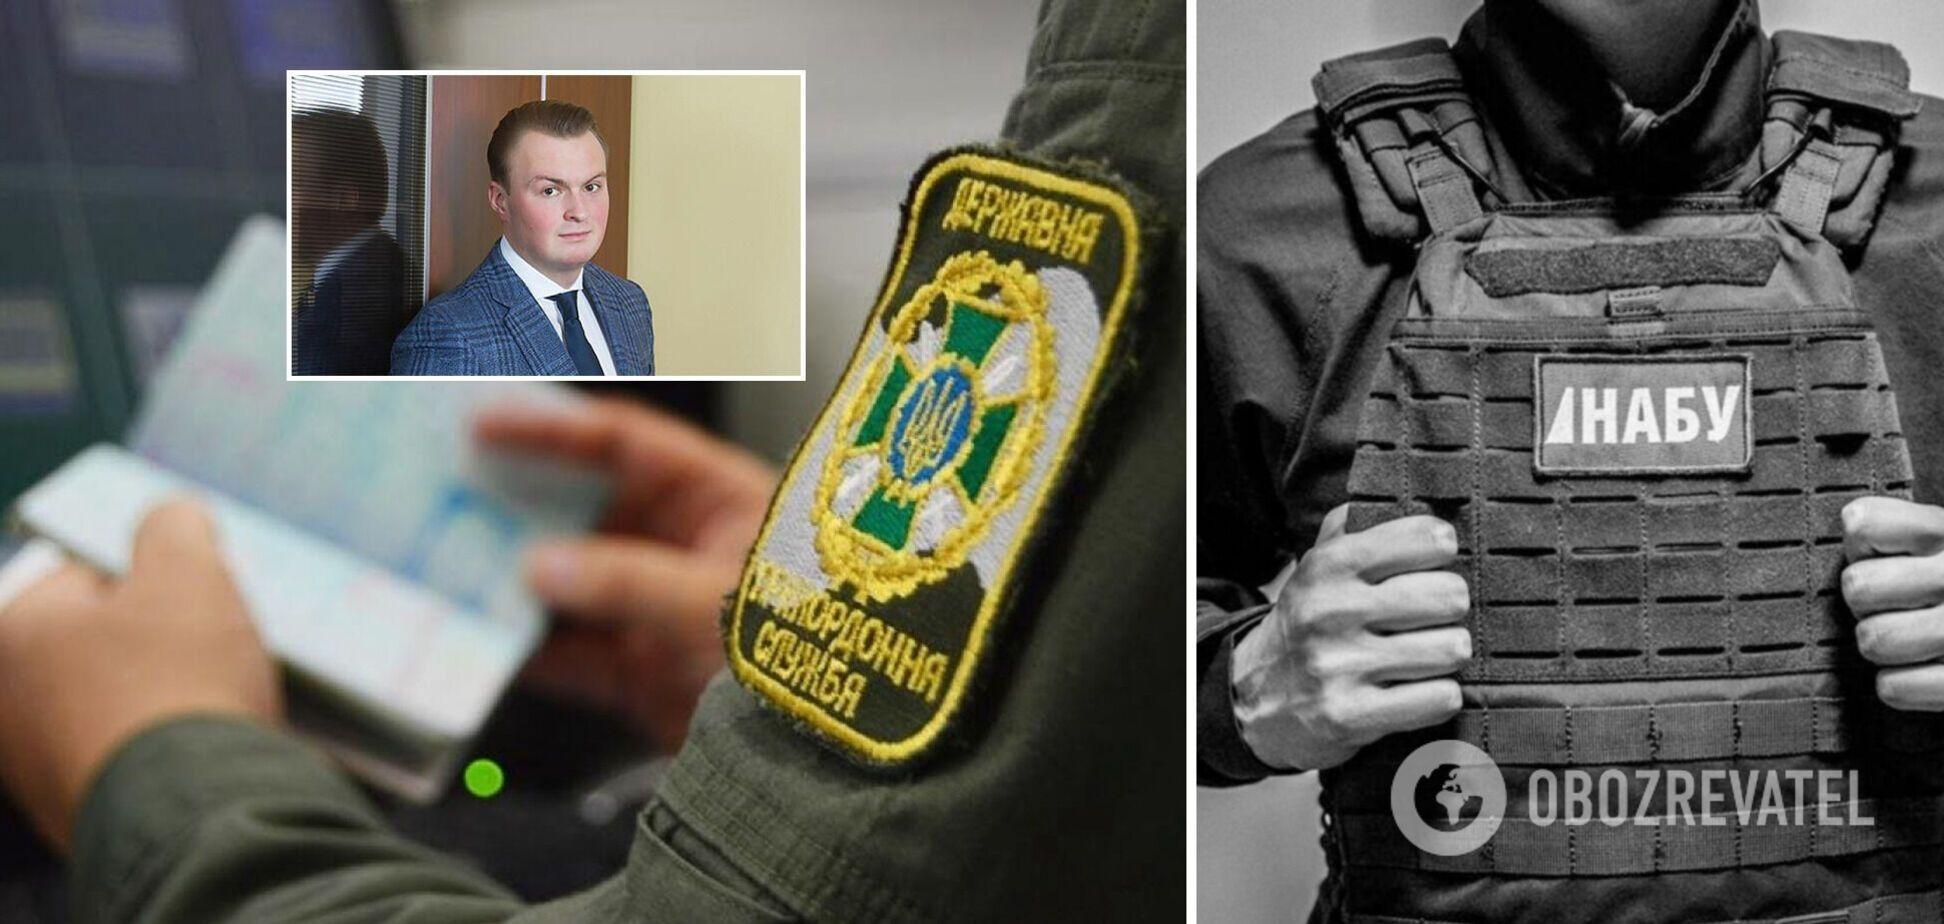 Оголошений у розшук Гладковський-молодший повернувся в Україну – ЗМІ